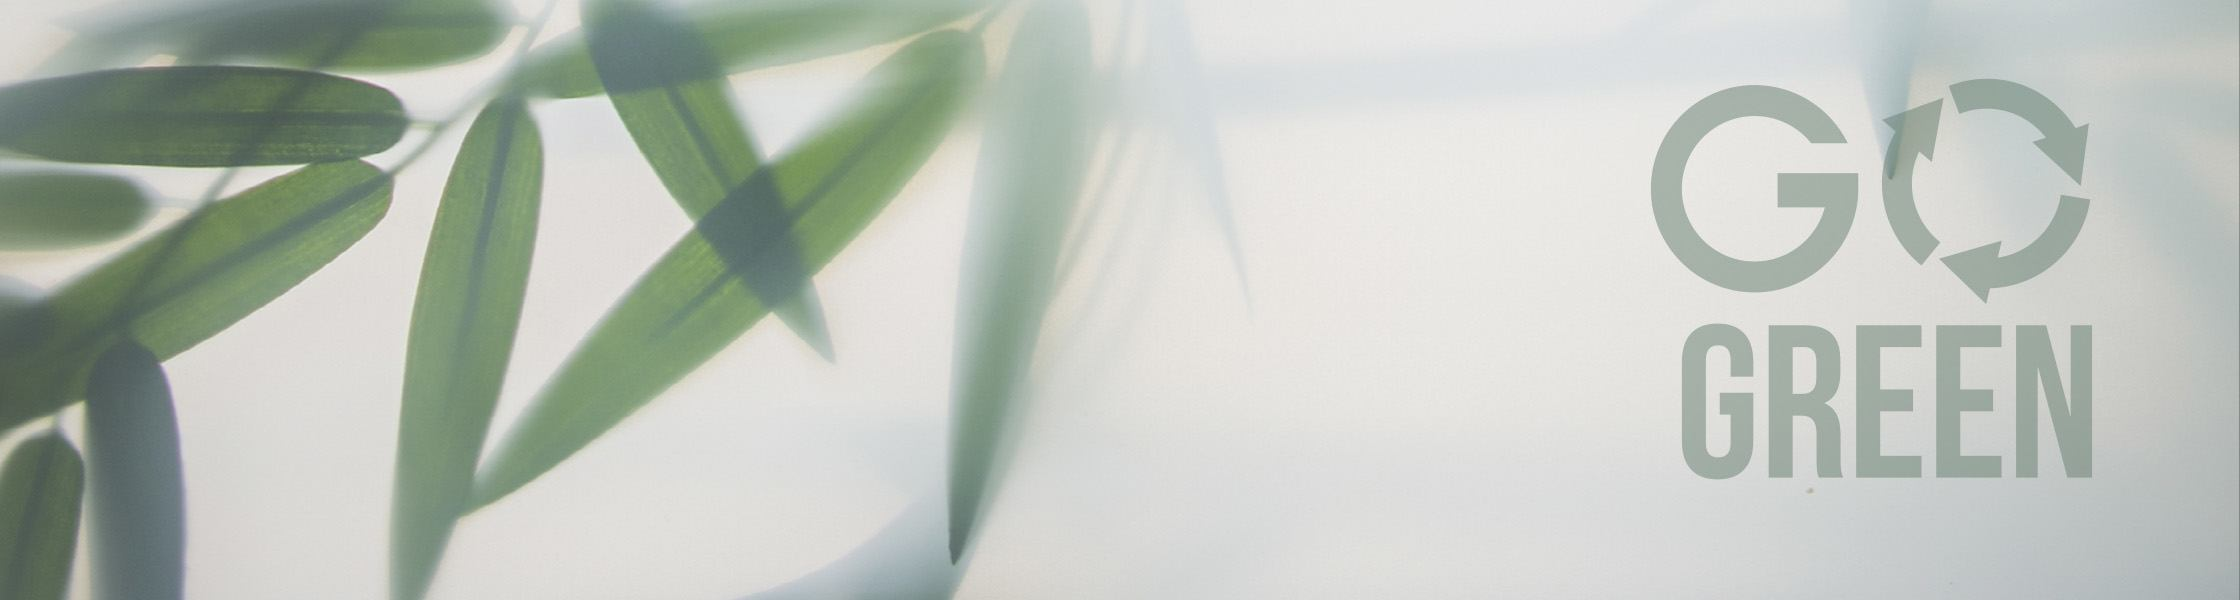 Odkryj nasz nowy e-katalog GO GREEN!